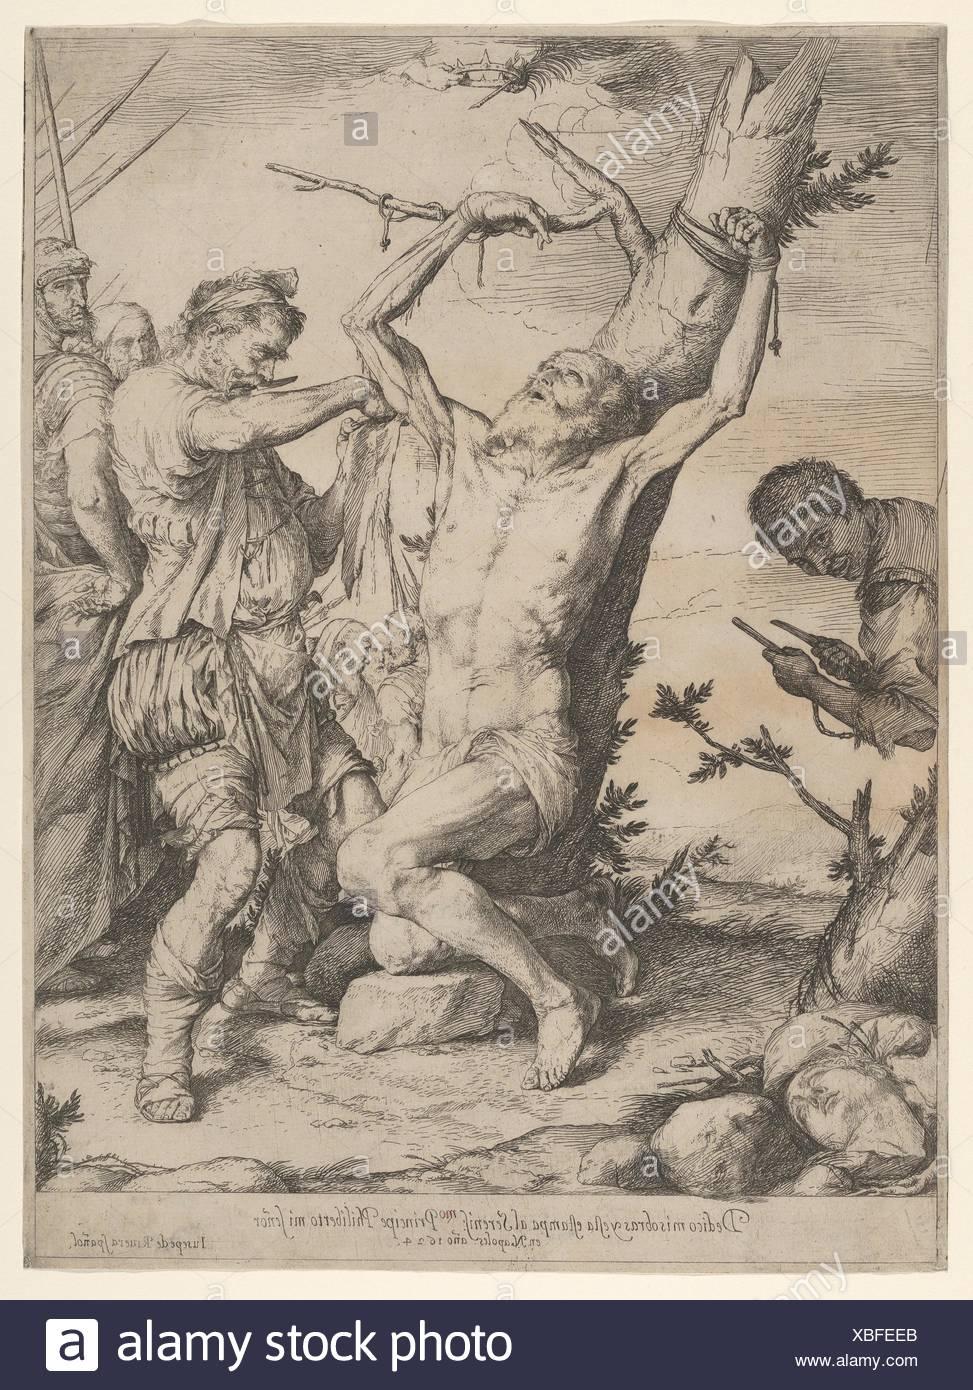 Artist: Jusepe de Ribera (called Lo Spagnoletto) (Spanish, Jótiva 1591-1652  Naples); Date: 1624; Medium: Etching